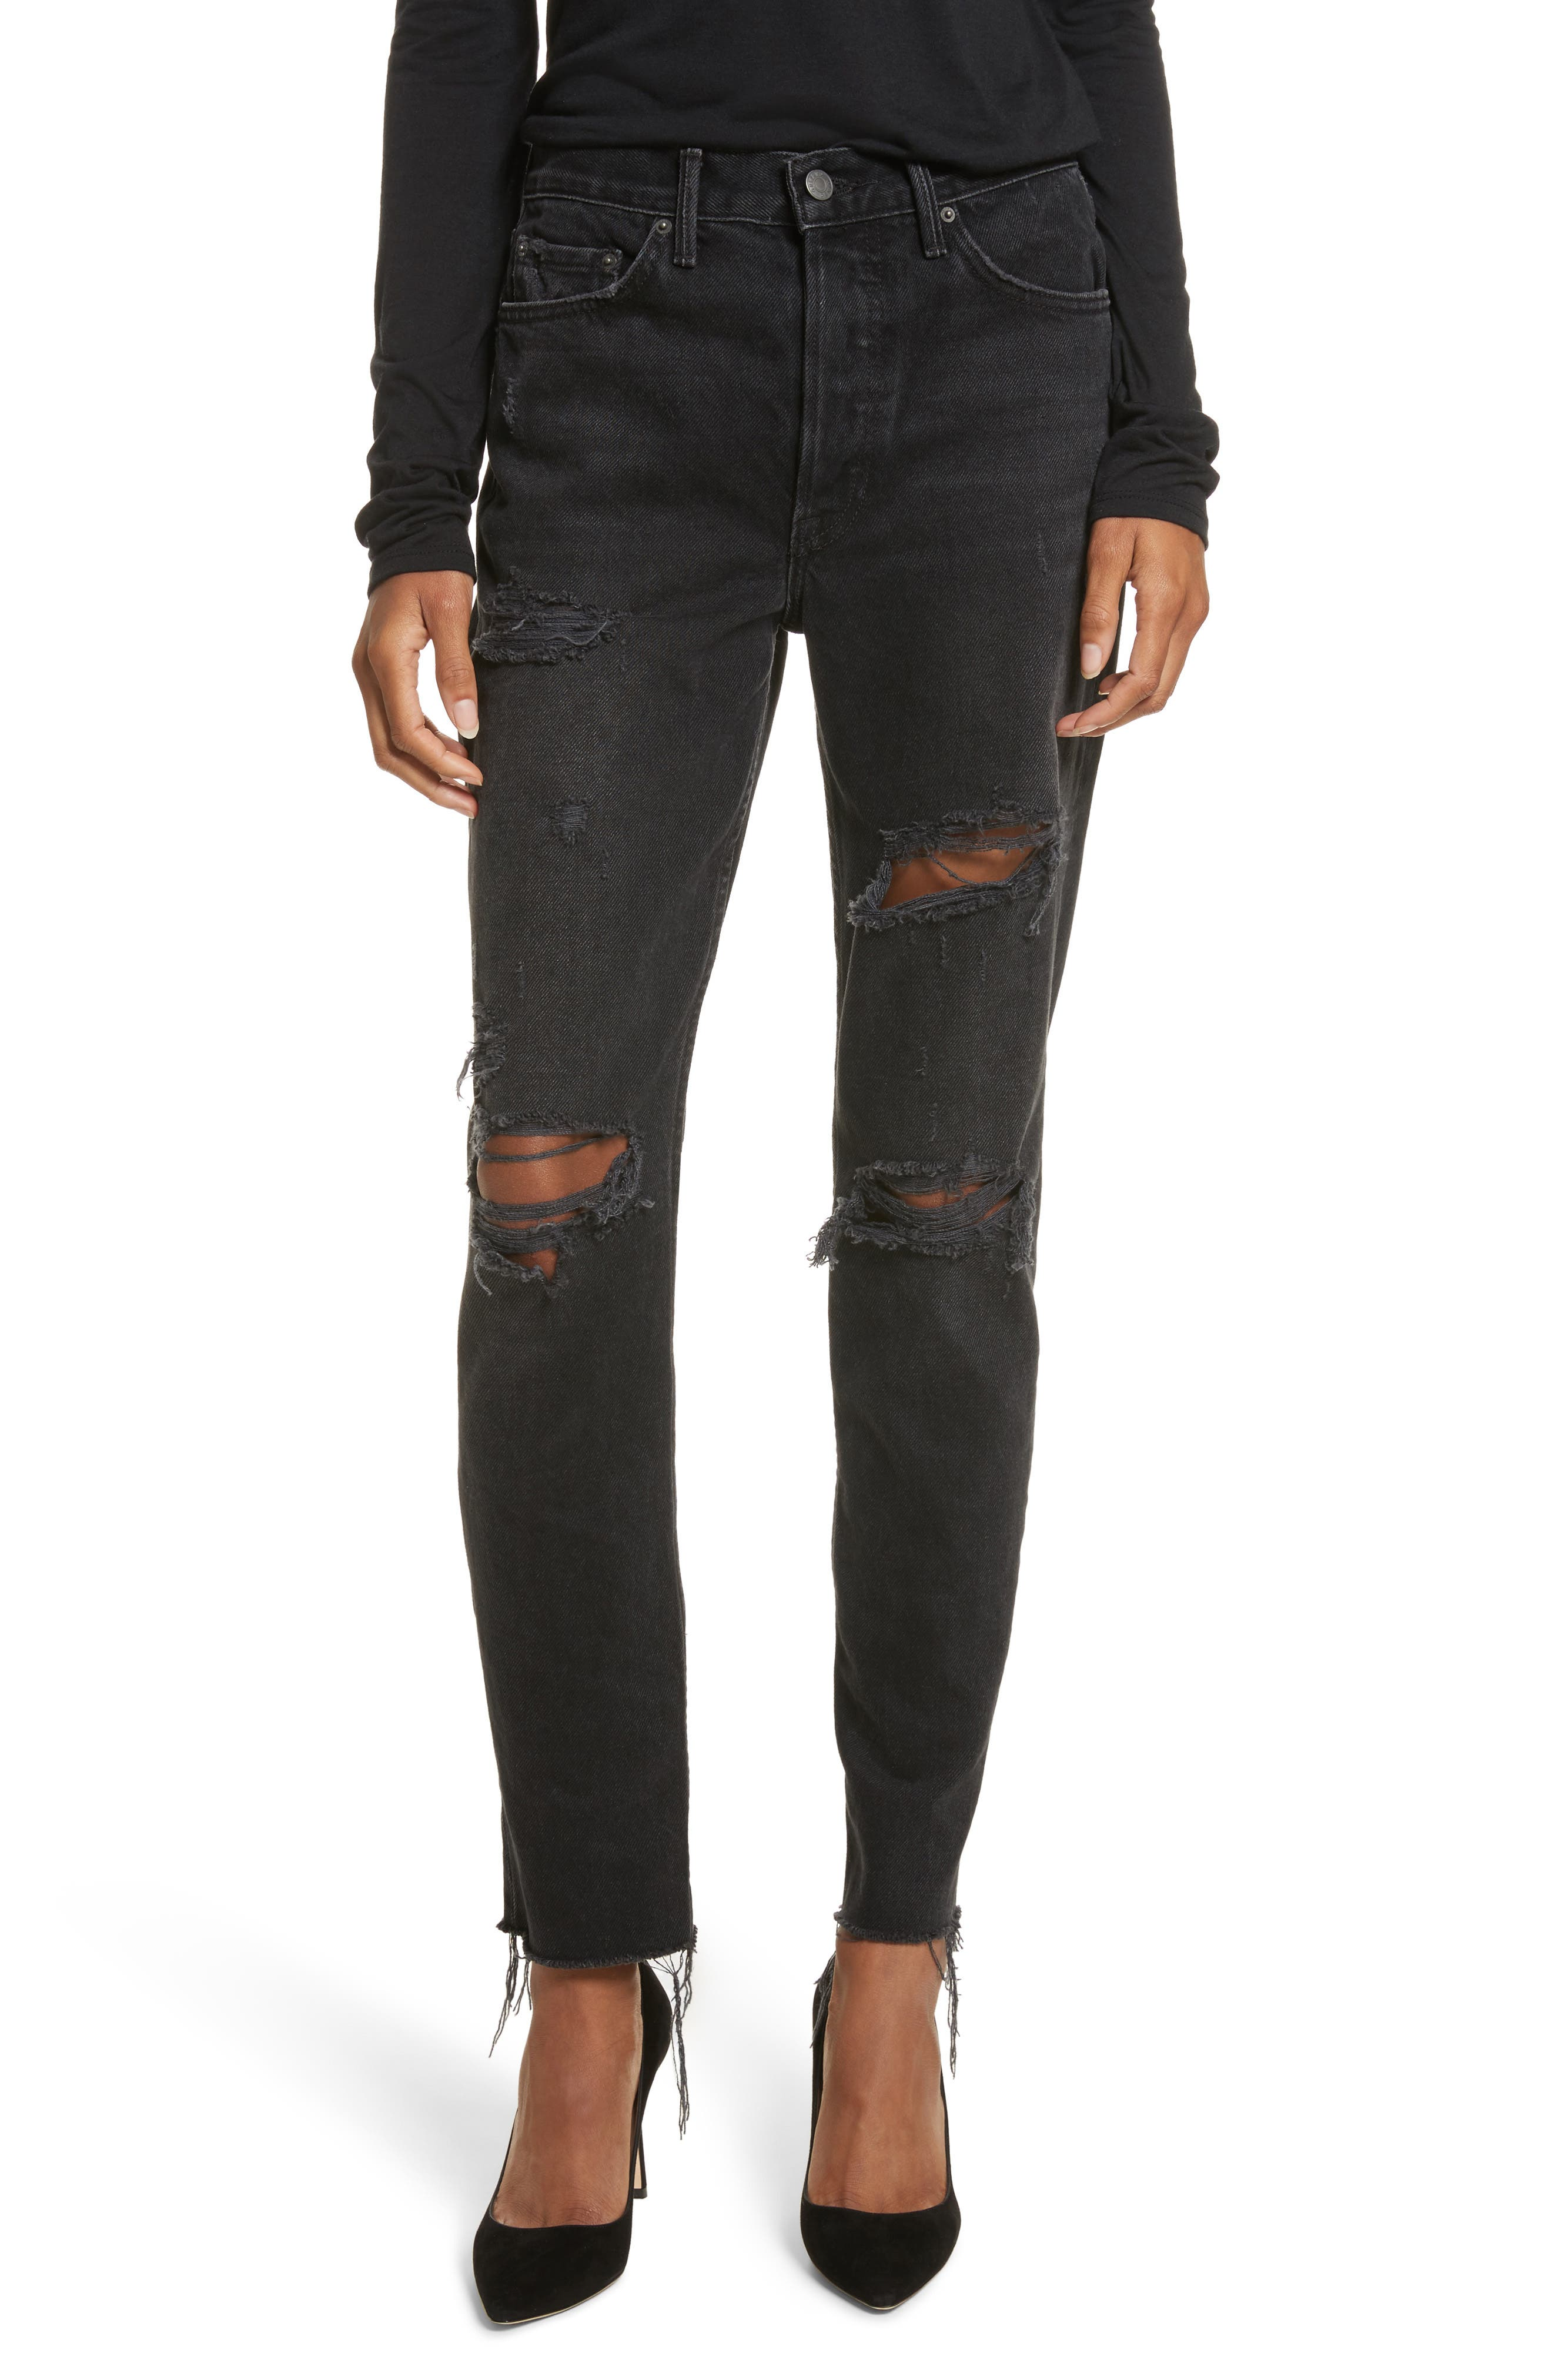 Karolina Ripped Rigid High Waist Skinny Jeans,                             Main thumbnail 1, color,                             TRAVELIN BAND